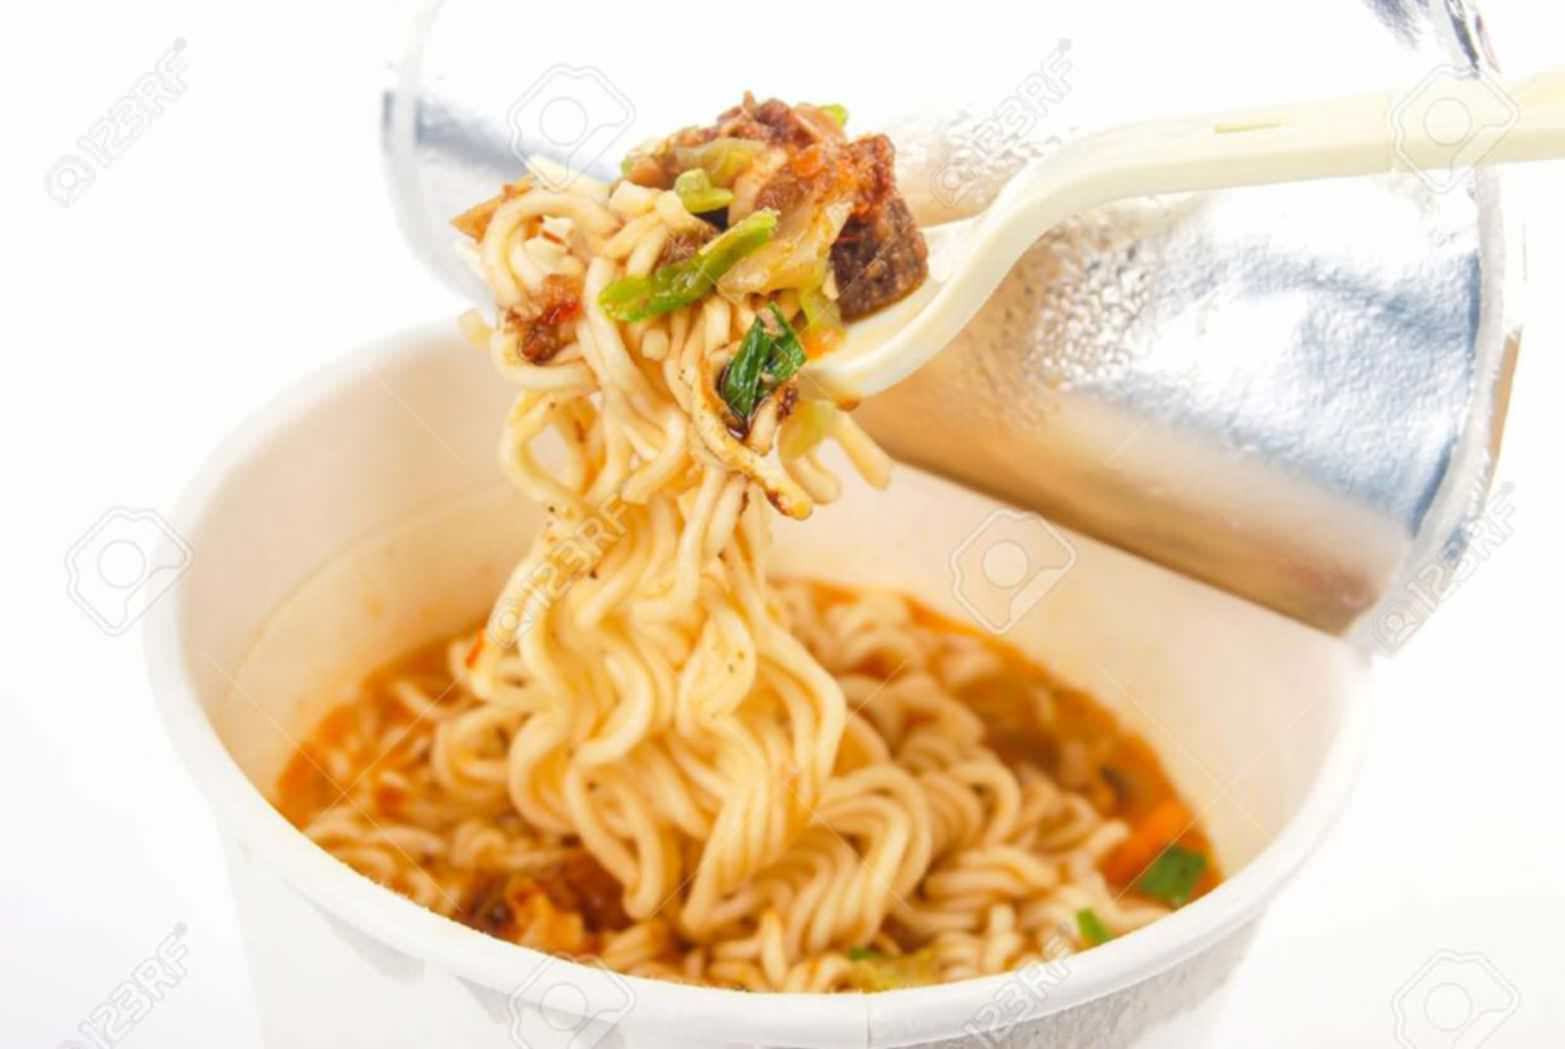 Ramen Noodles Unhealthy  Ingre nts That Make Instant Noodles Unhealthy